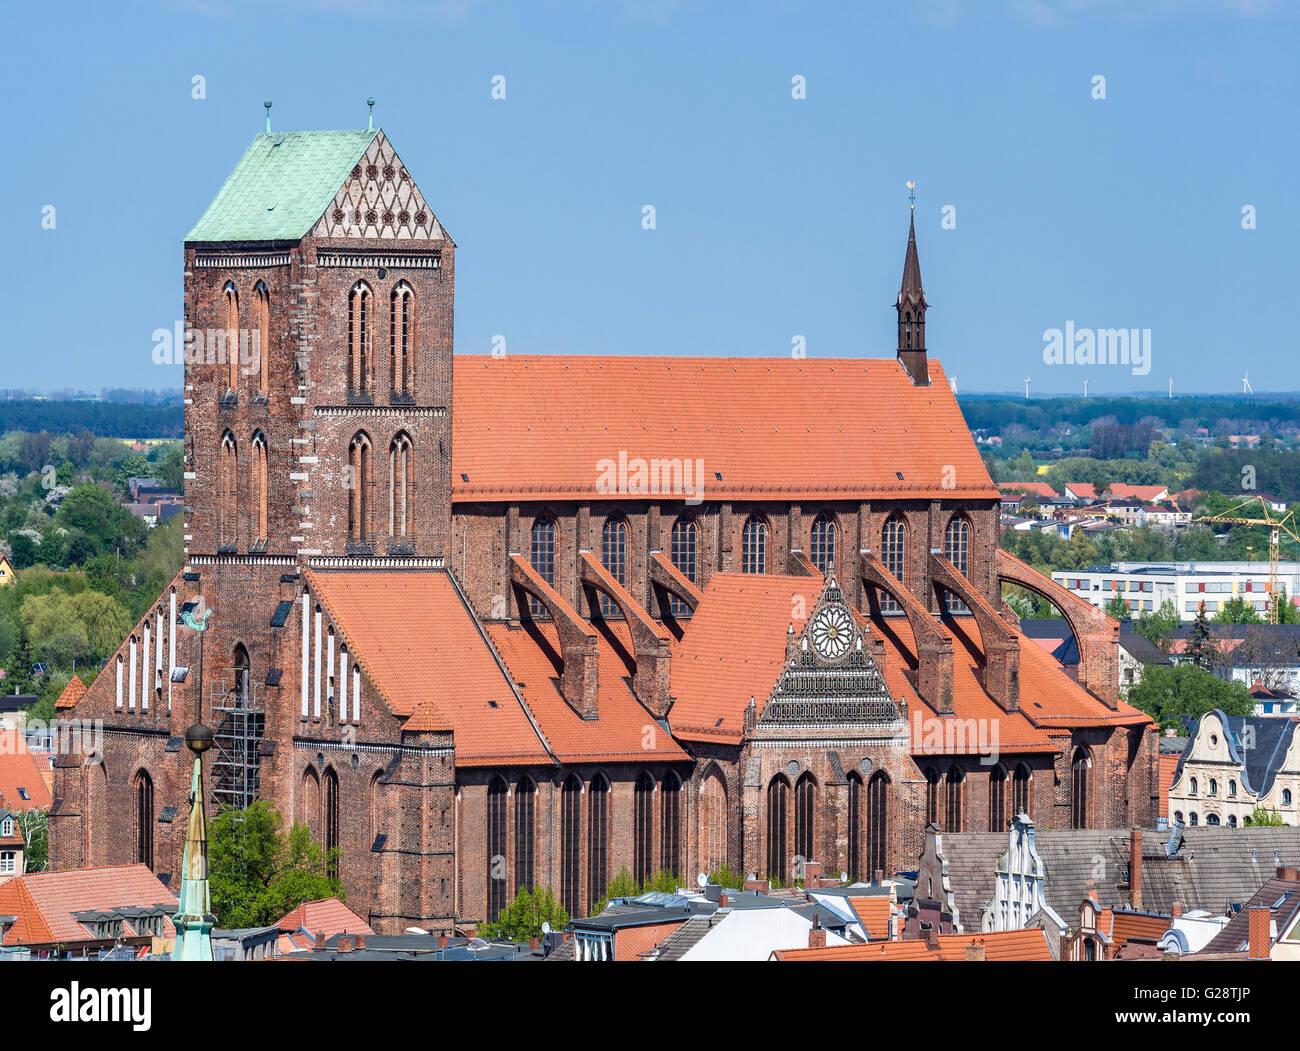 St. Nikolai church, seen from platform of St. Georgen church, Wismar, Germany. - Stock Image